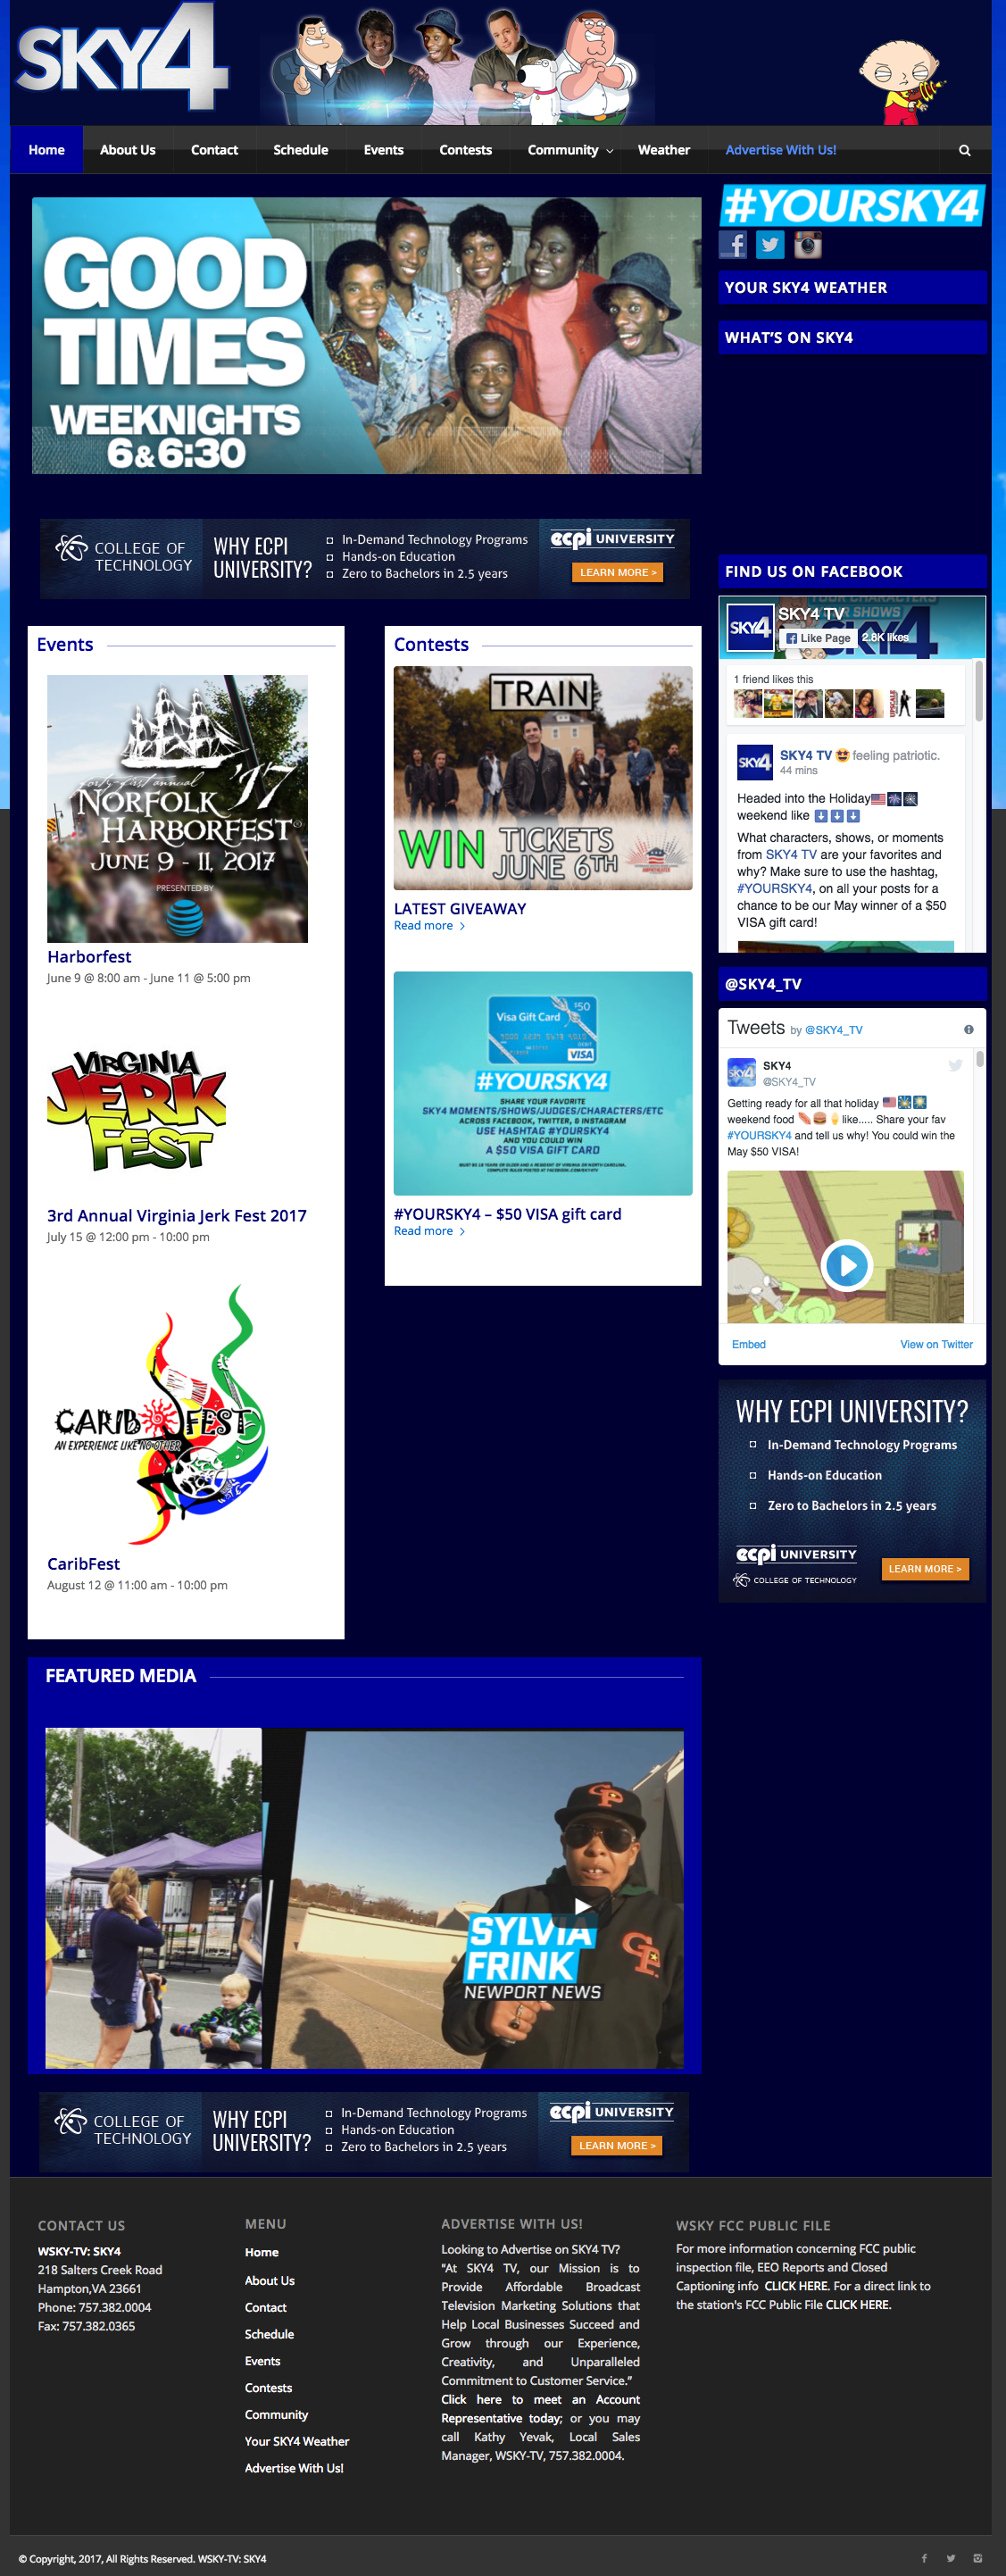 Website - Sky4